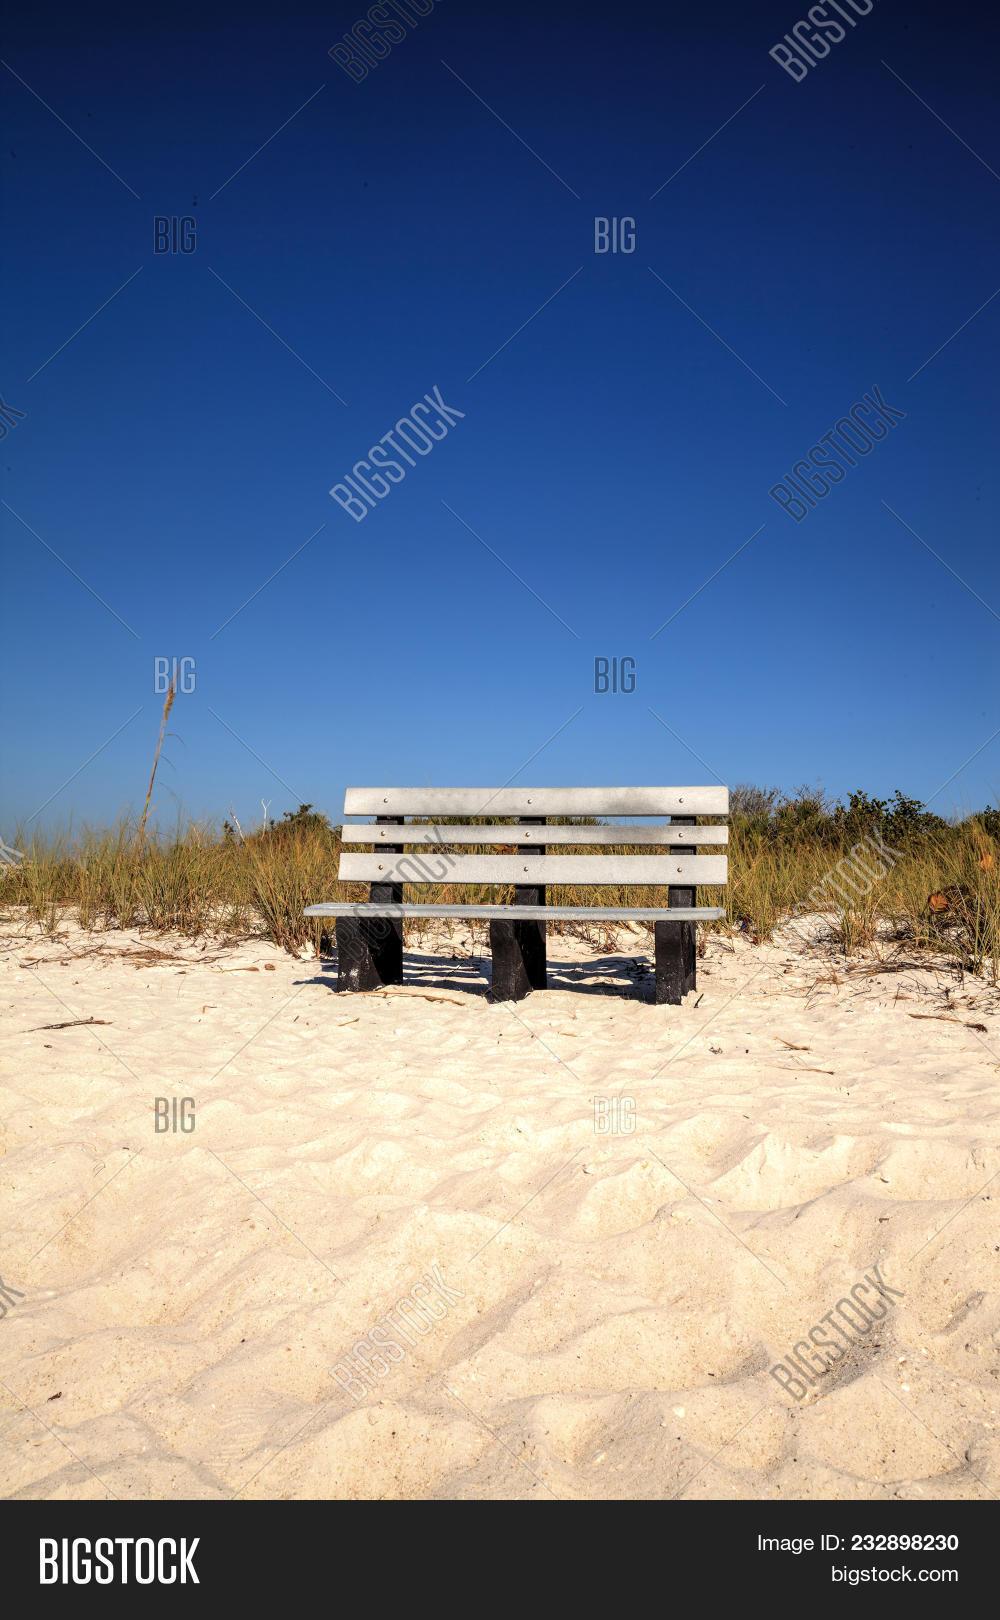 Pleasant Wood Bench On White Image Photo Free Trial Bigstock Ibusinesslaw Wood Chair Design Ideas Ibusinesslaworg